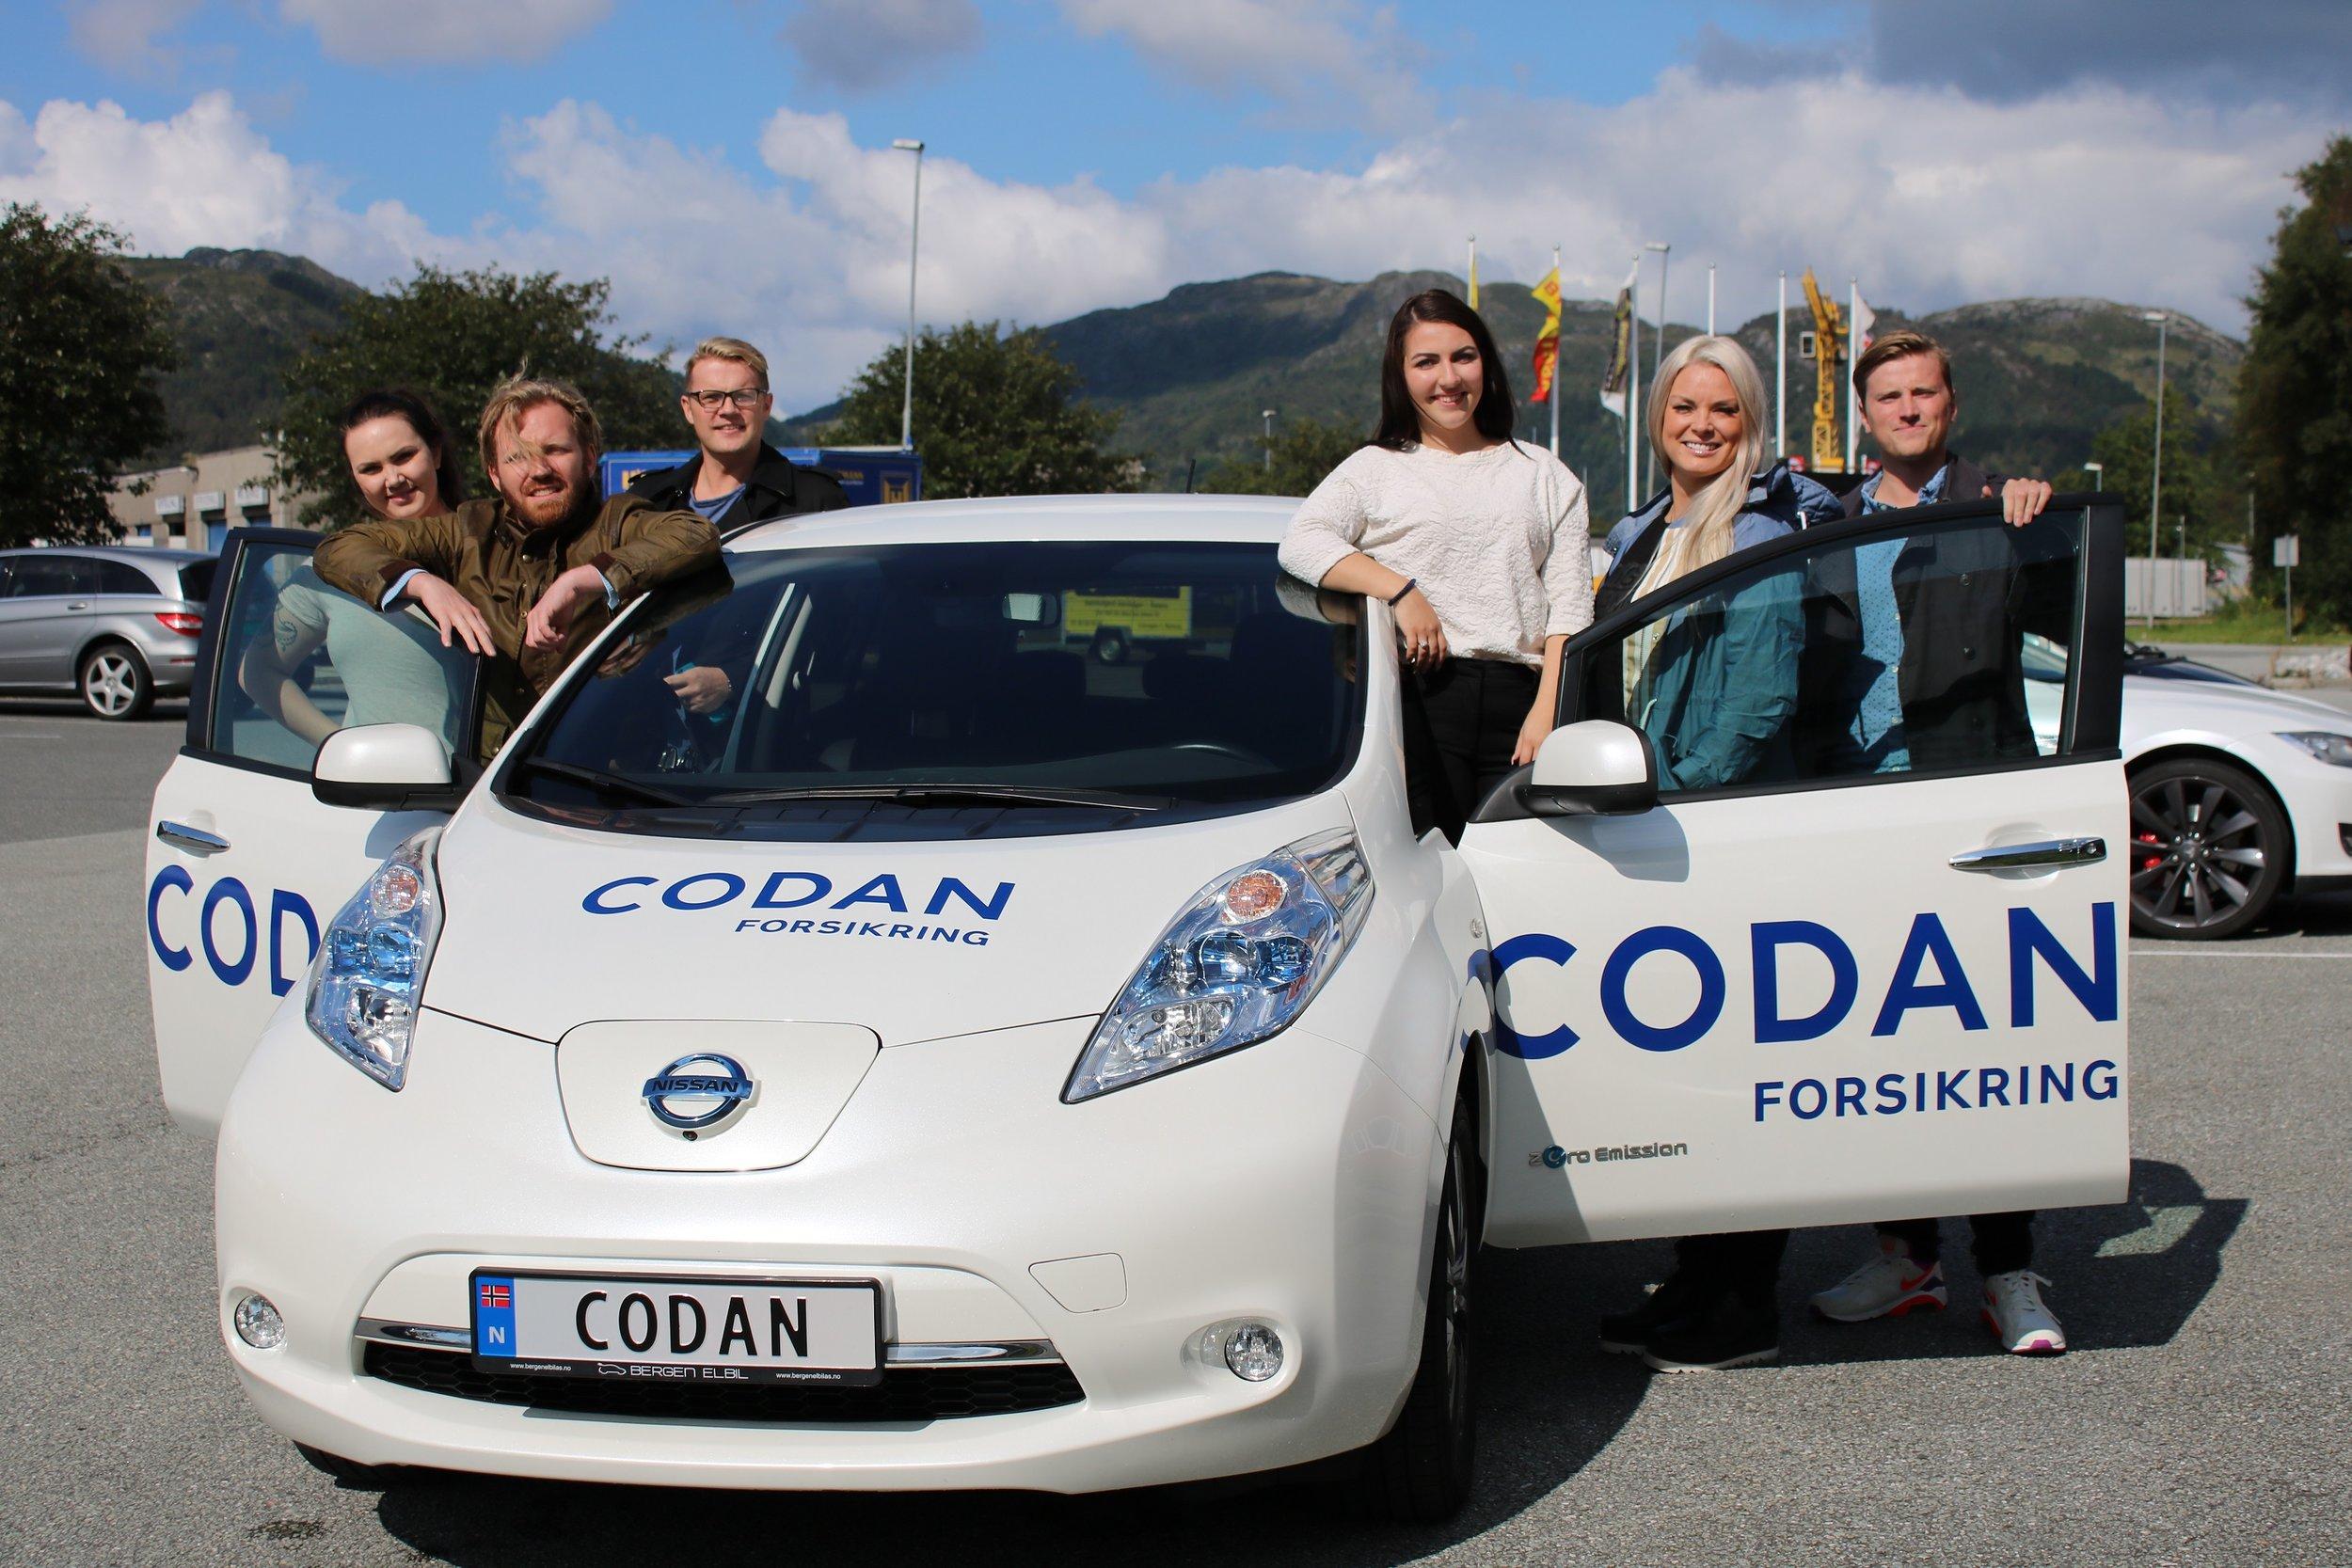 Rådgiverne hos codan i åsane har sin egen codan-bil de benytter i kundemøter.